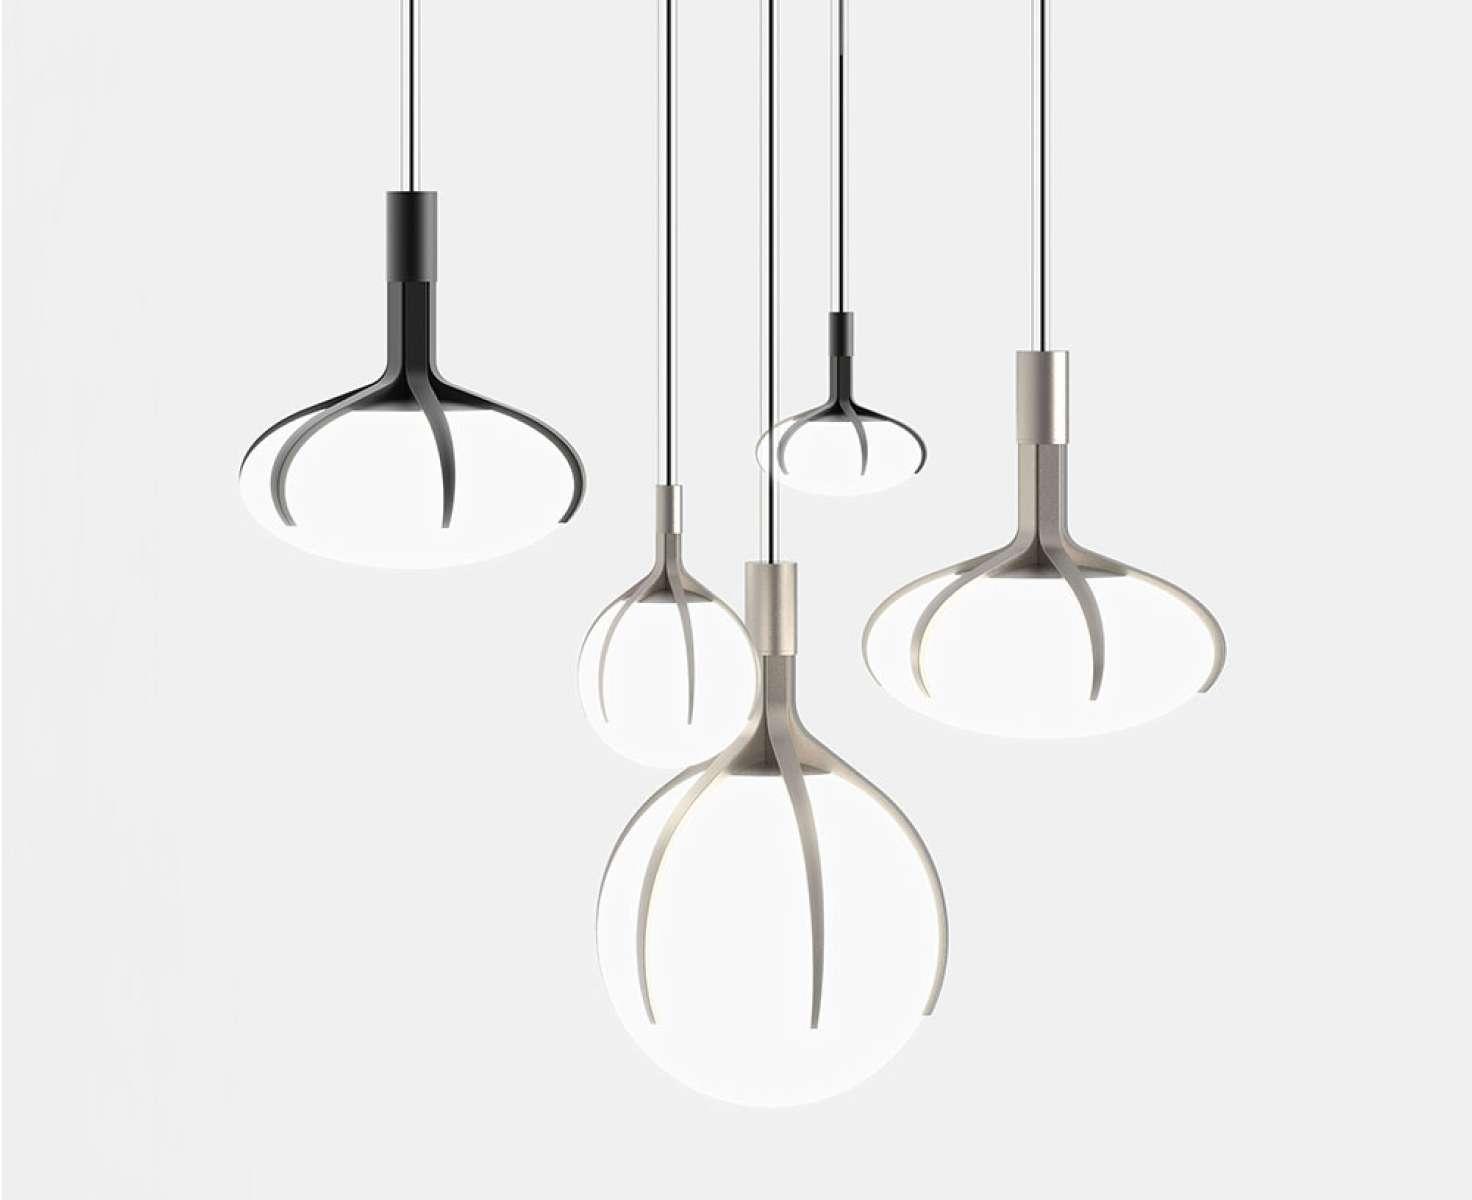 Studio Marco Piva – Product design – 460